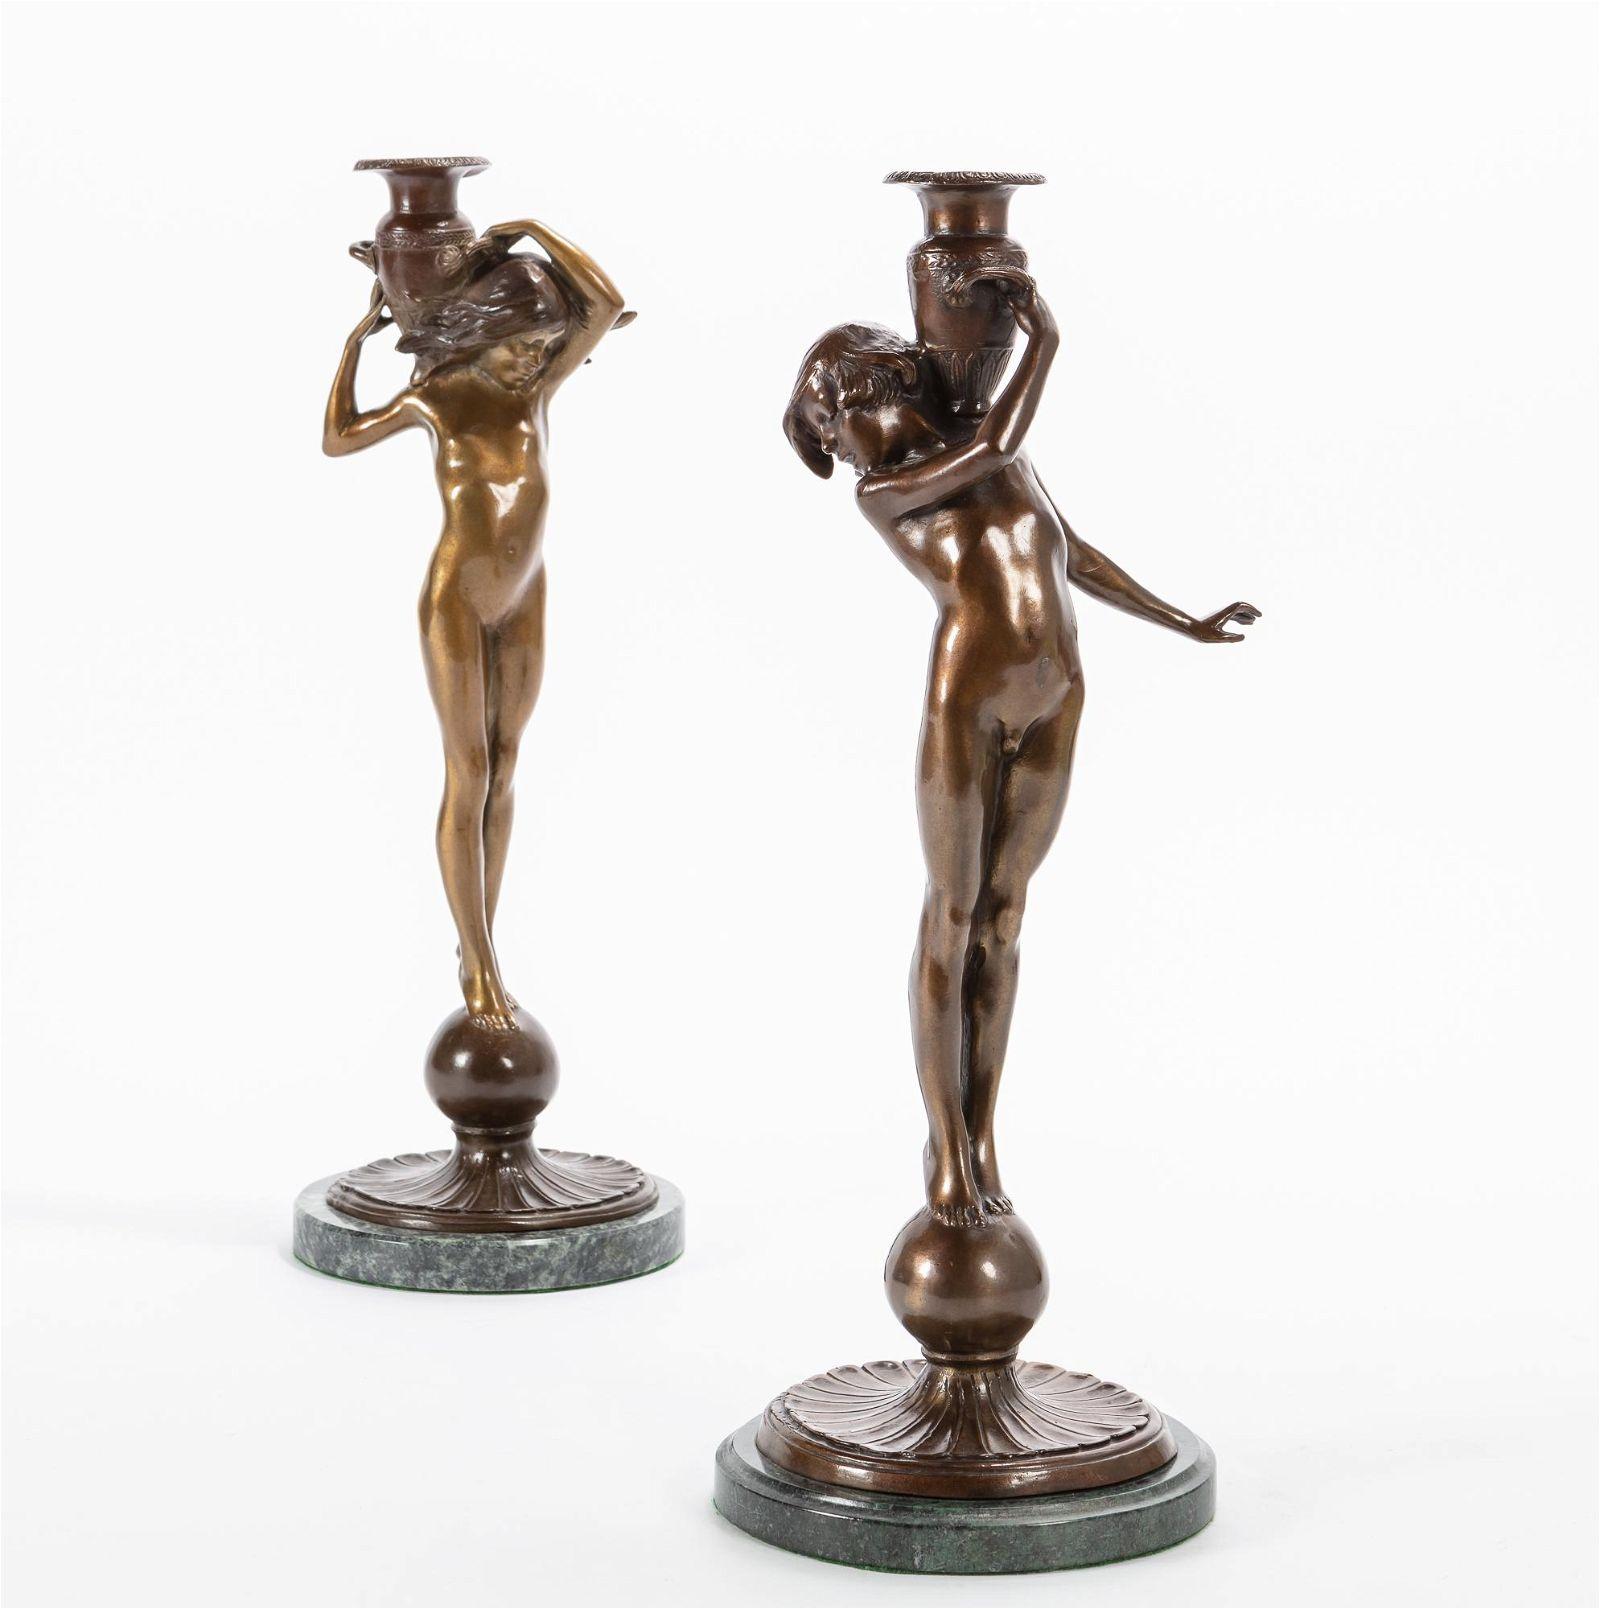 Edward Francis McCartan bronze candlesticks